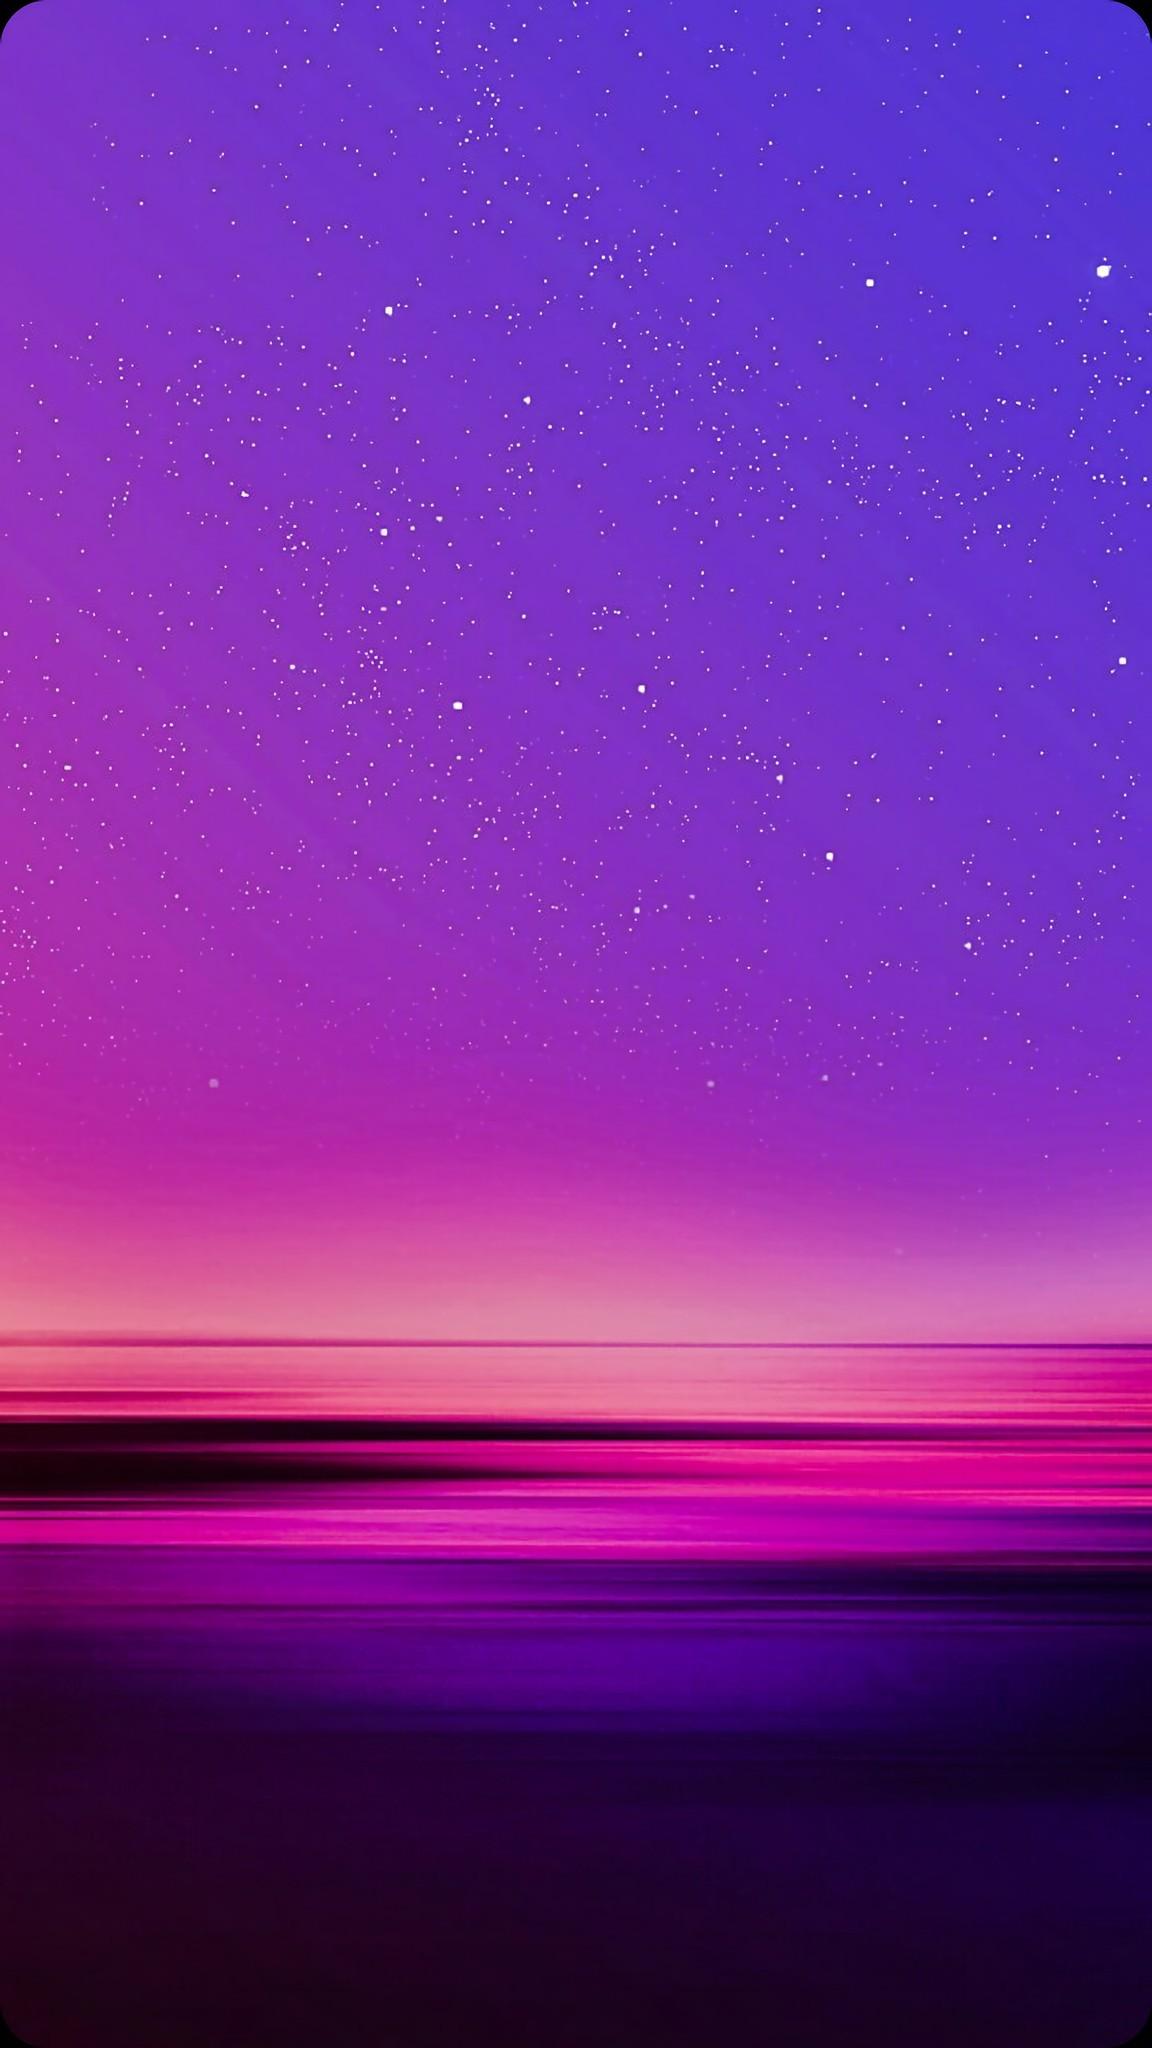 Pretty Purple Backgrounds Girls